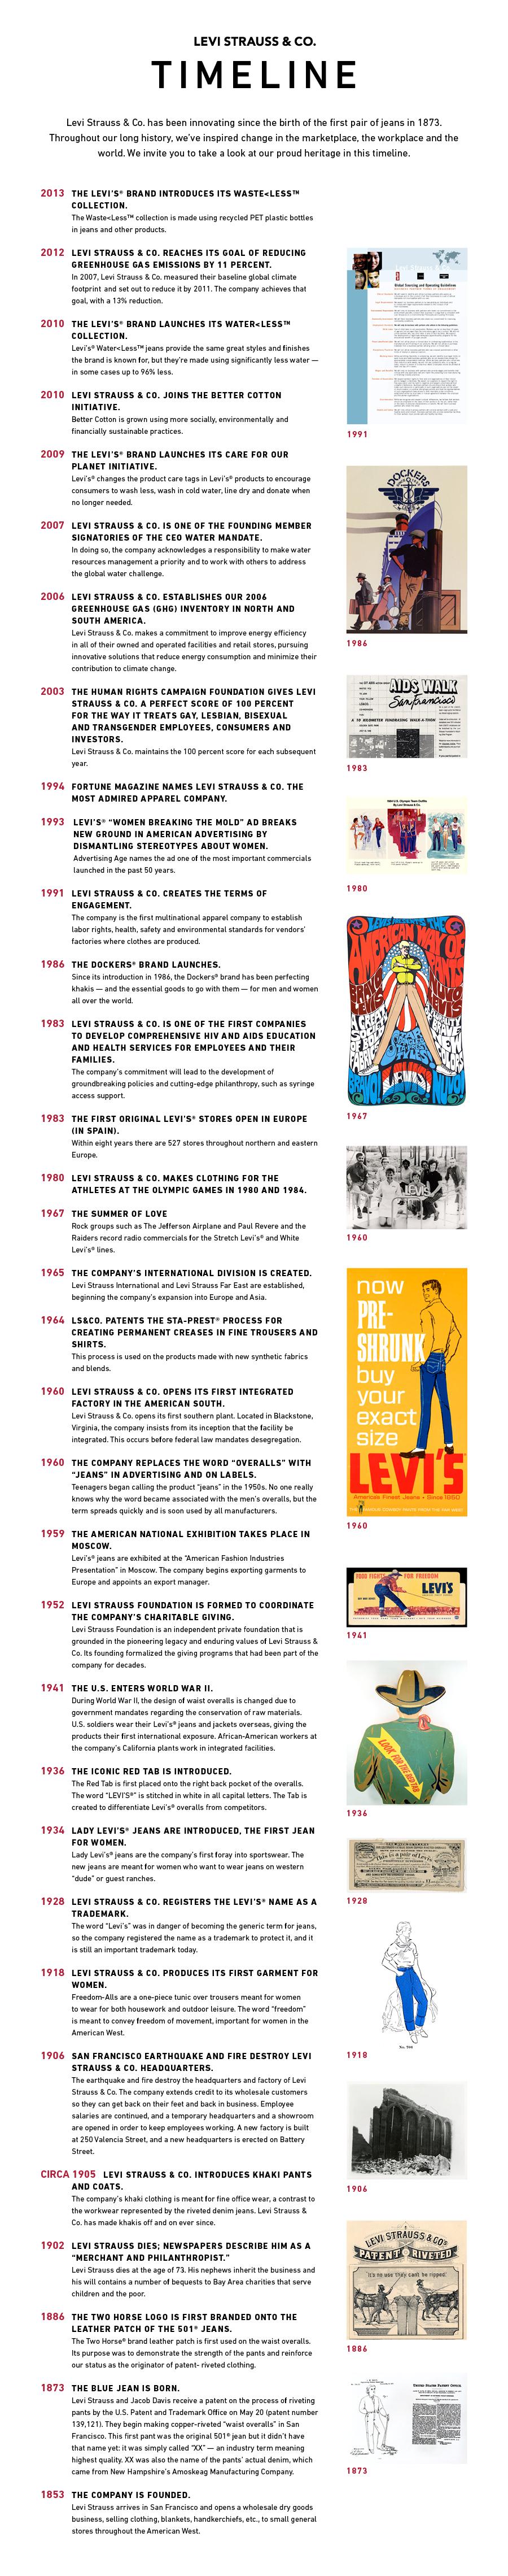 heritage-timeline